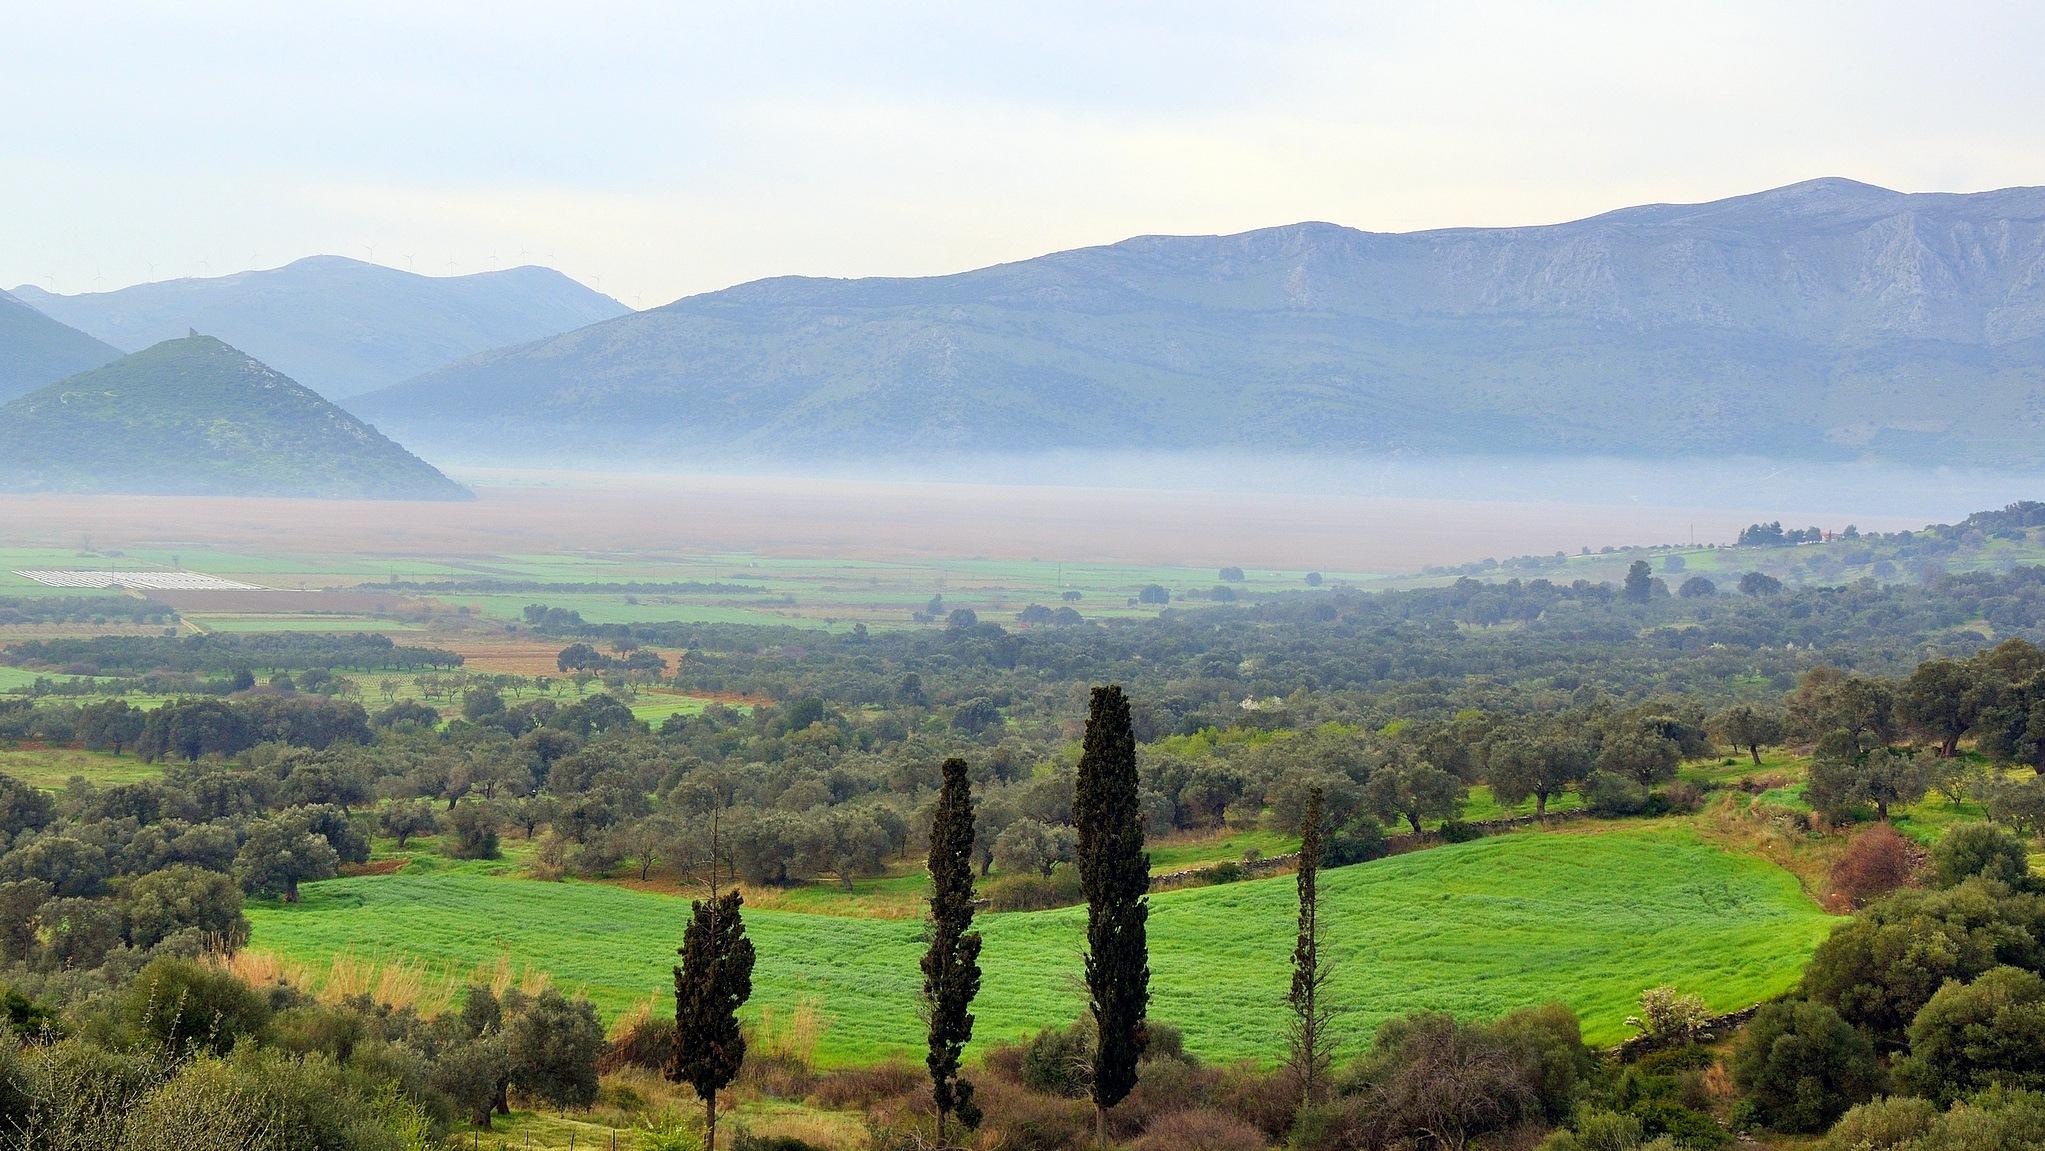 Misty plain. by Stamatis Vlahos